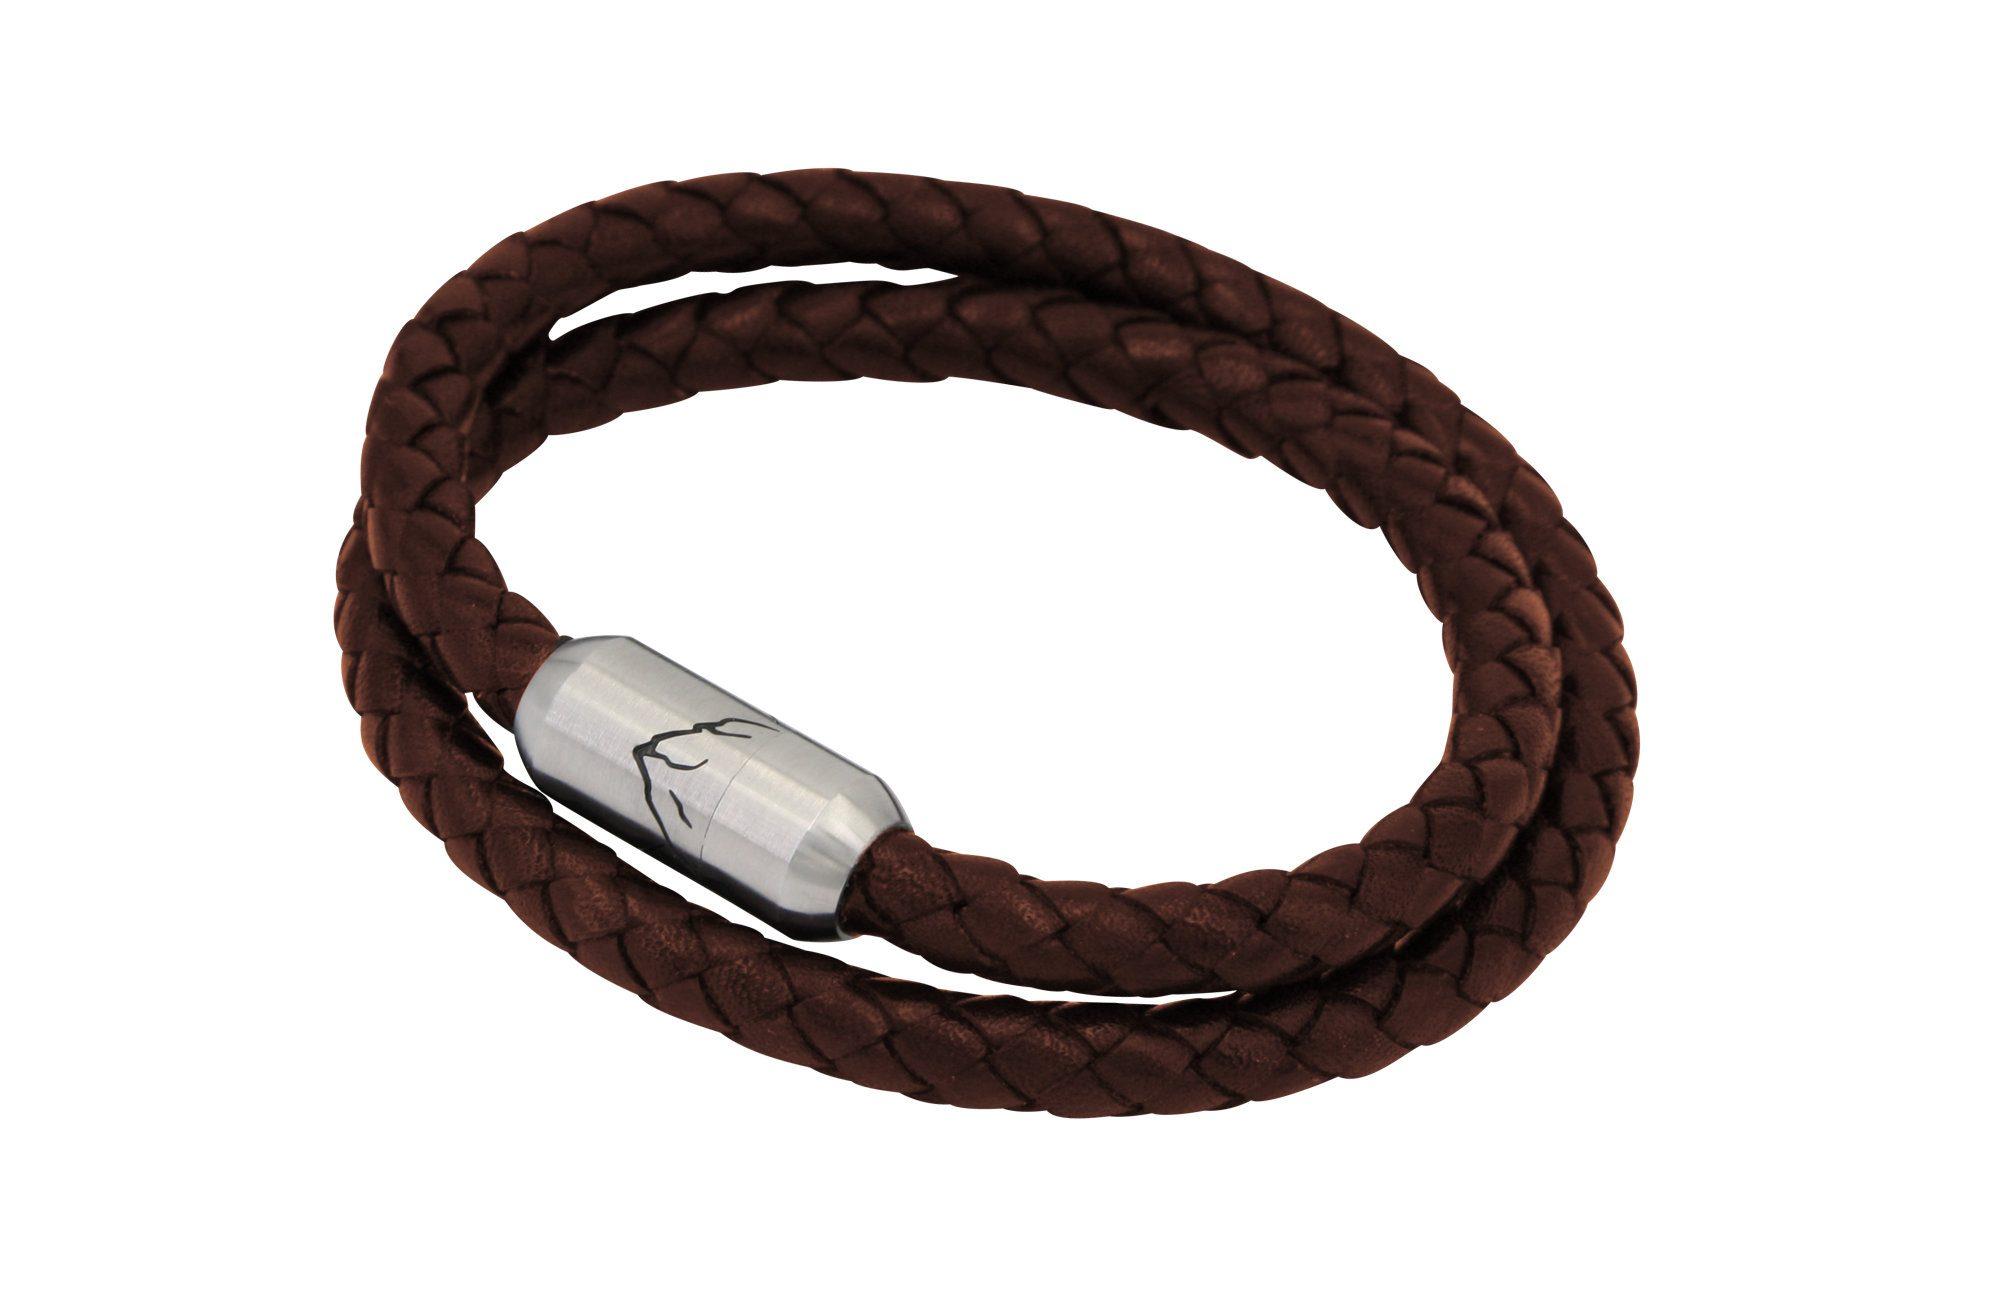 Fjella Bergseil Armband Doppelseil Haselhuhn Leder Braun Webseite